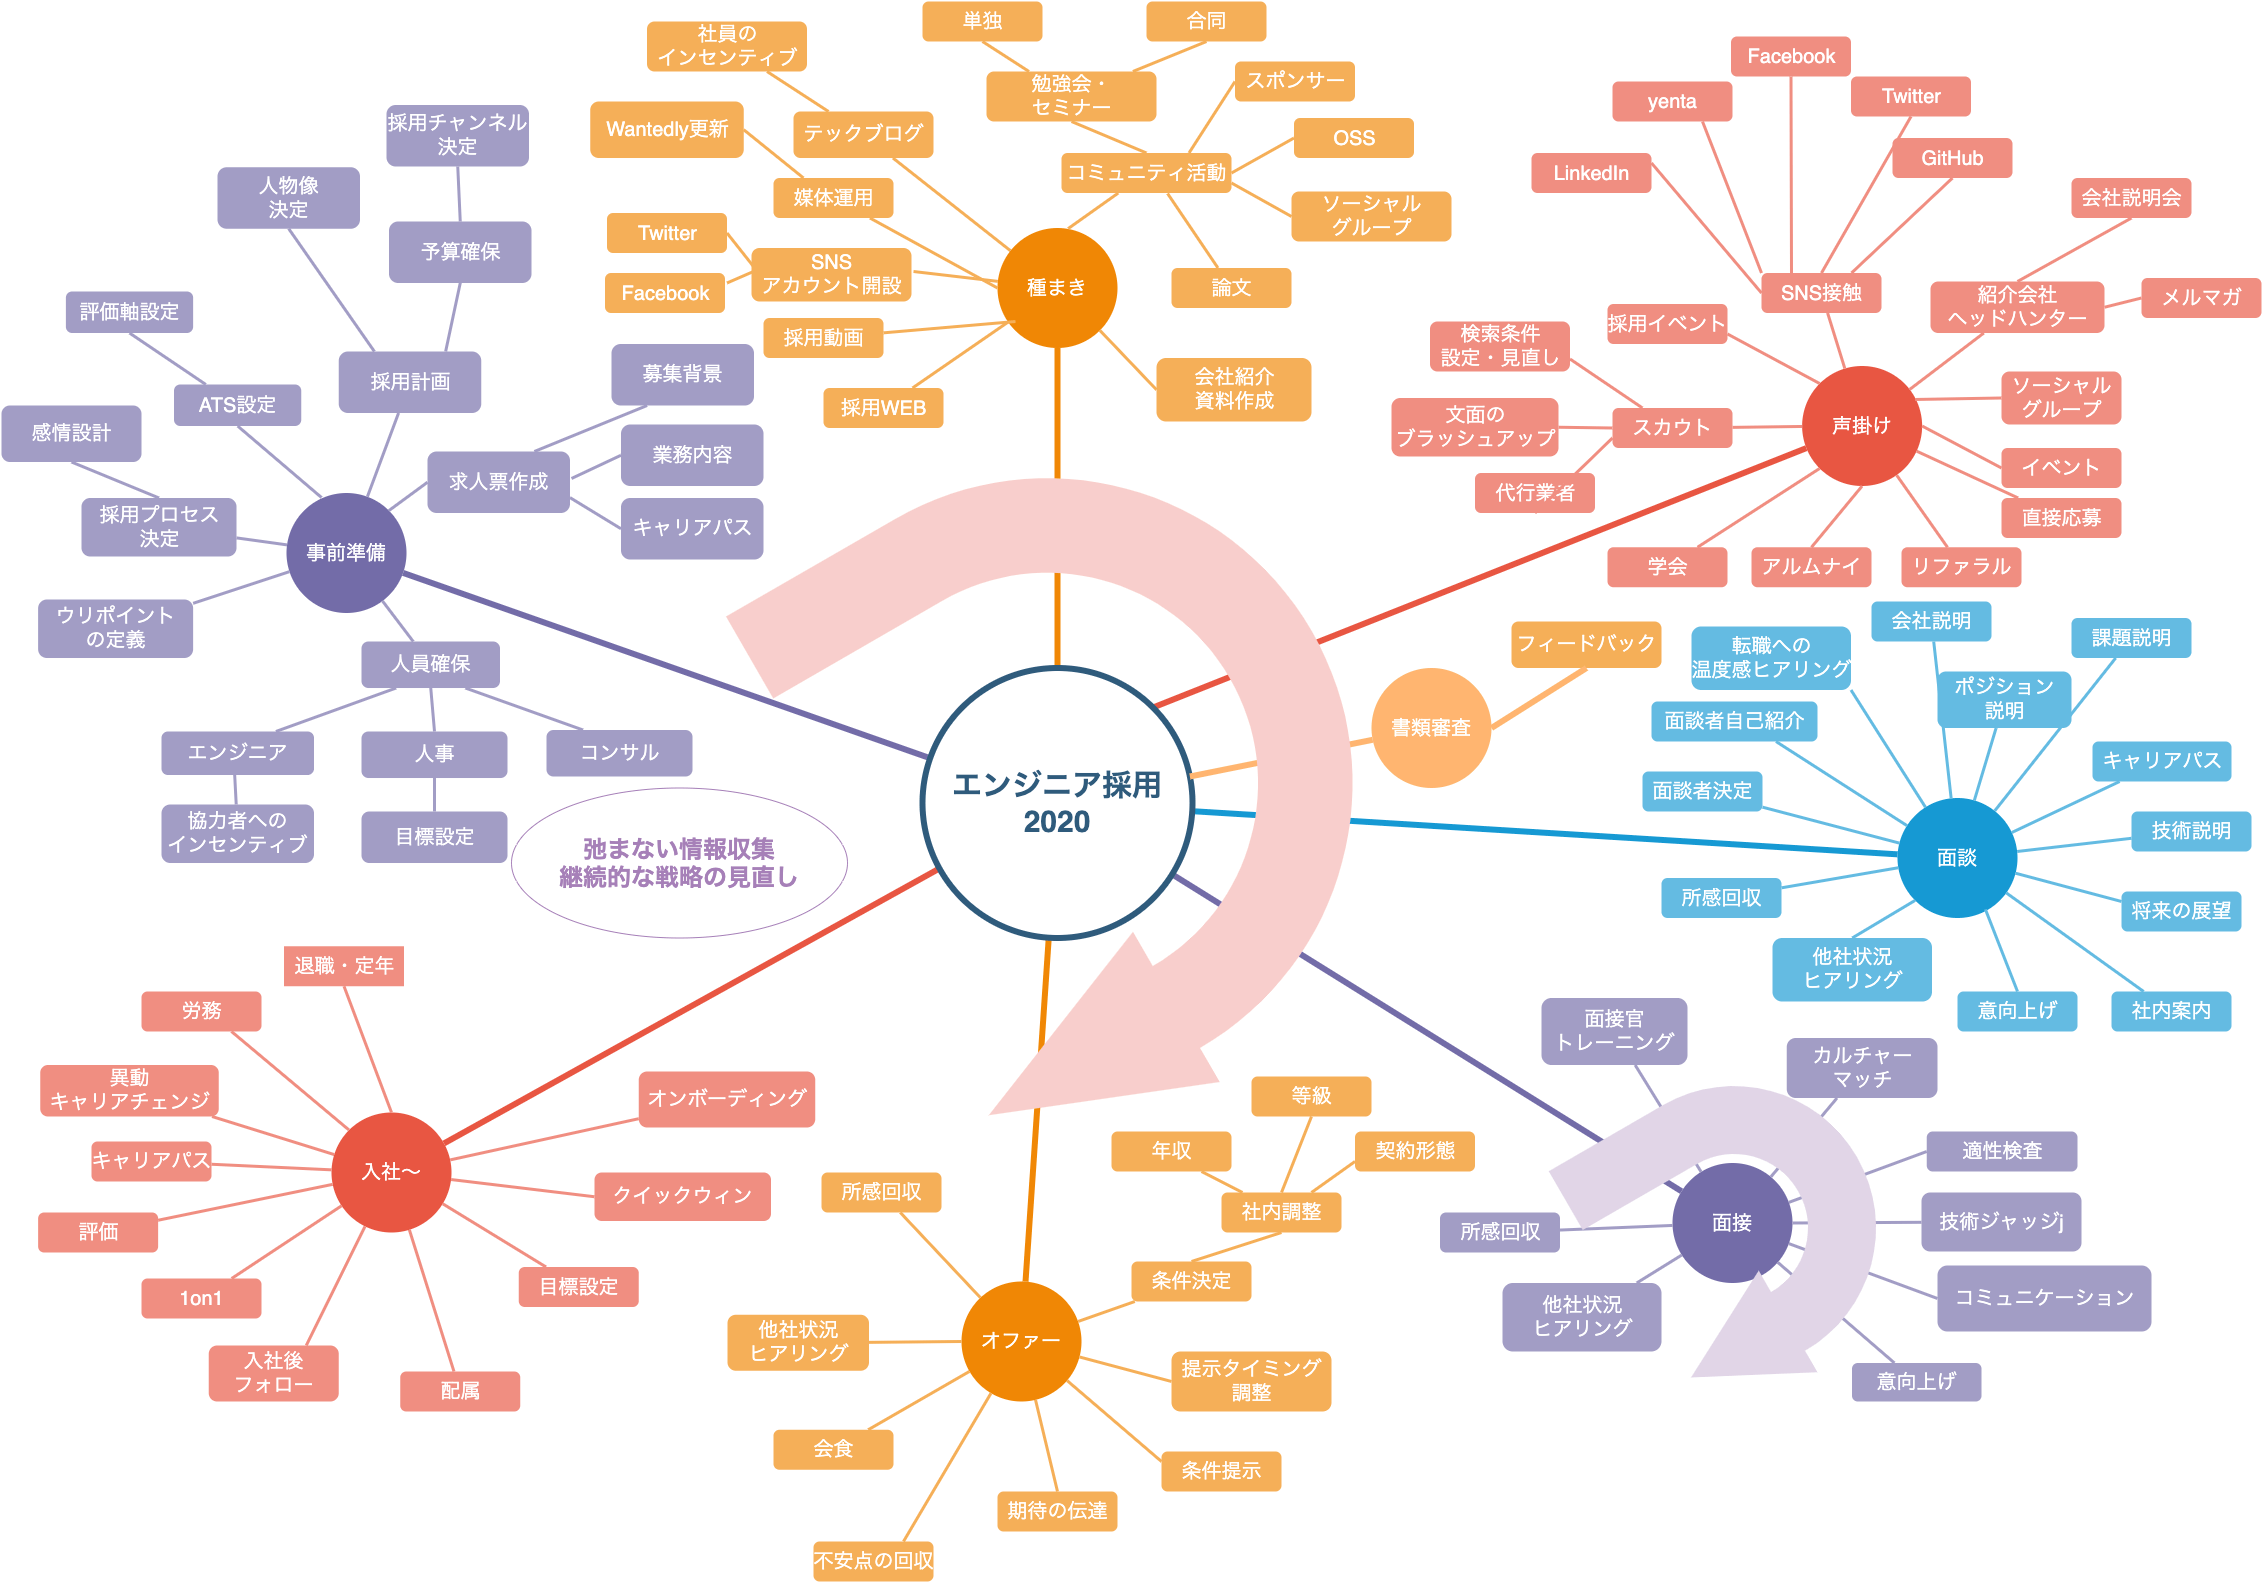 ITエンジニア採用の難しさを要素分解・図示してみた 2020